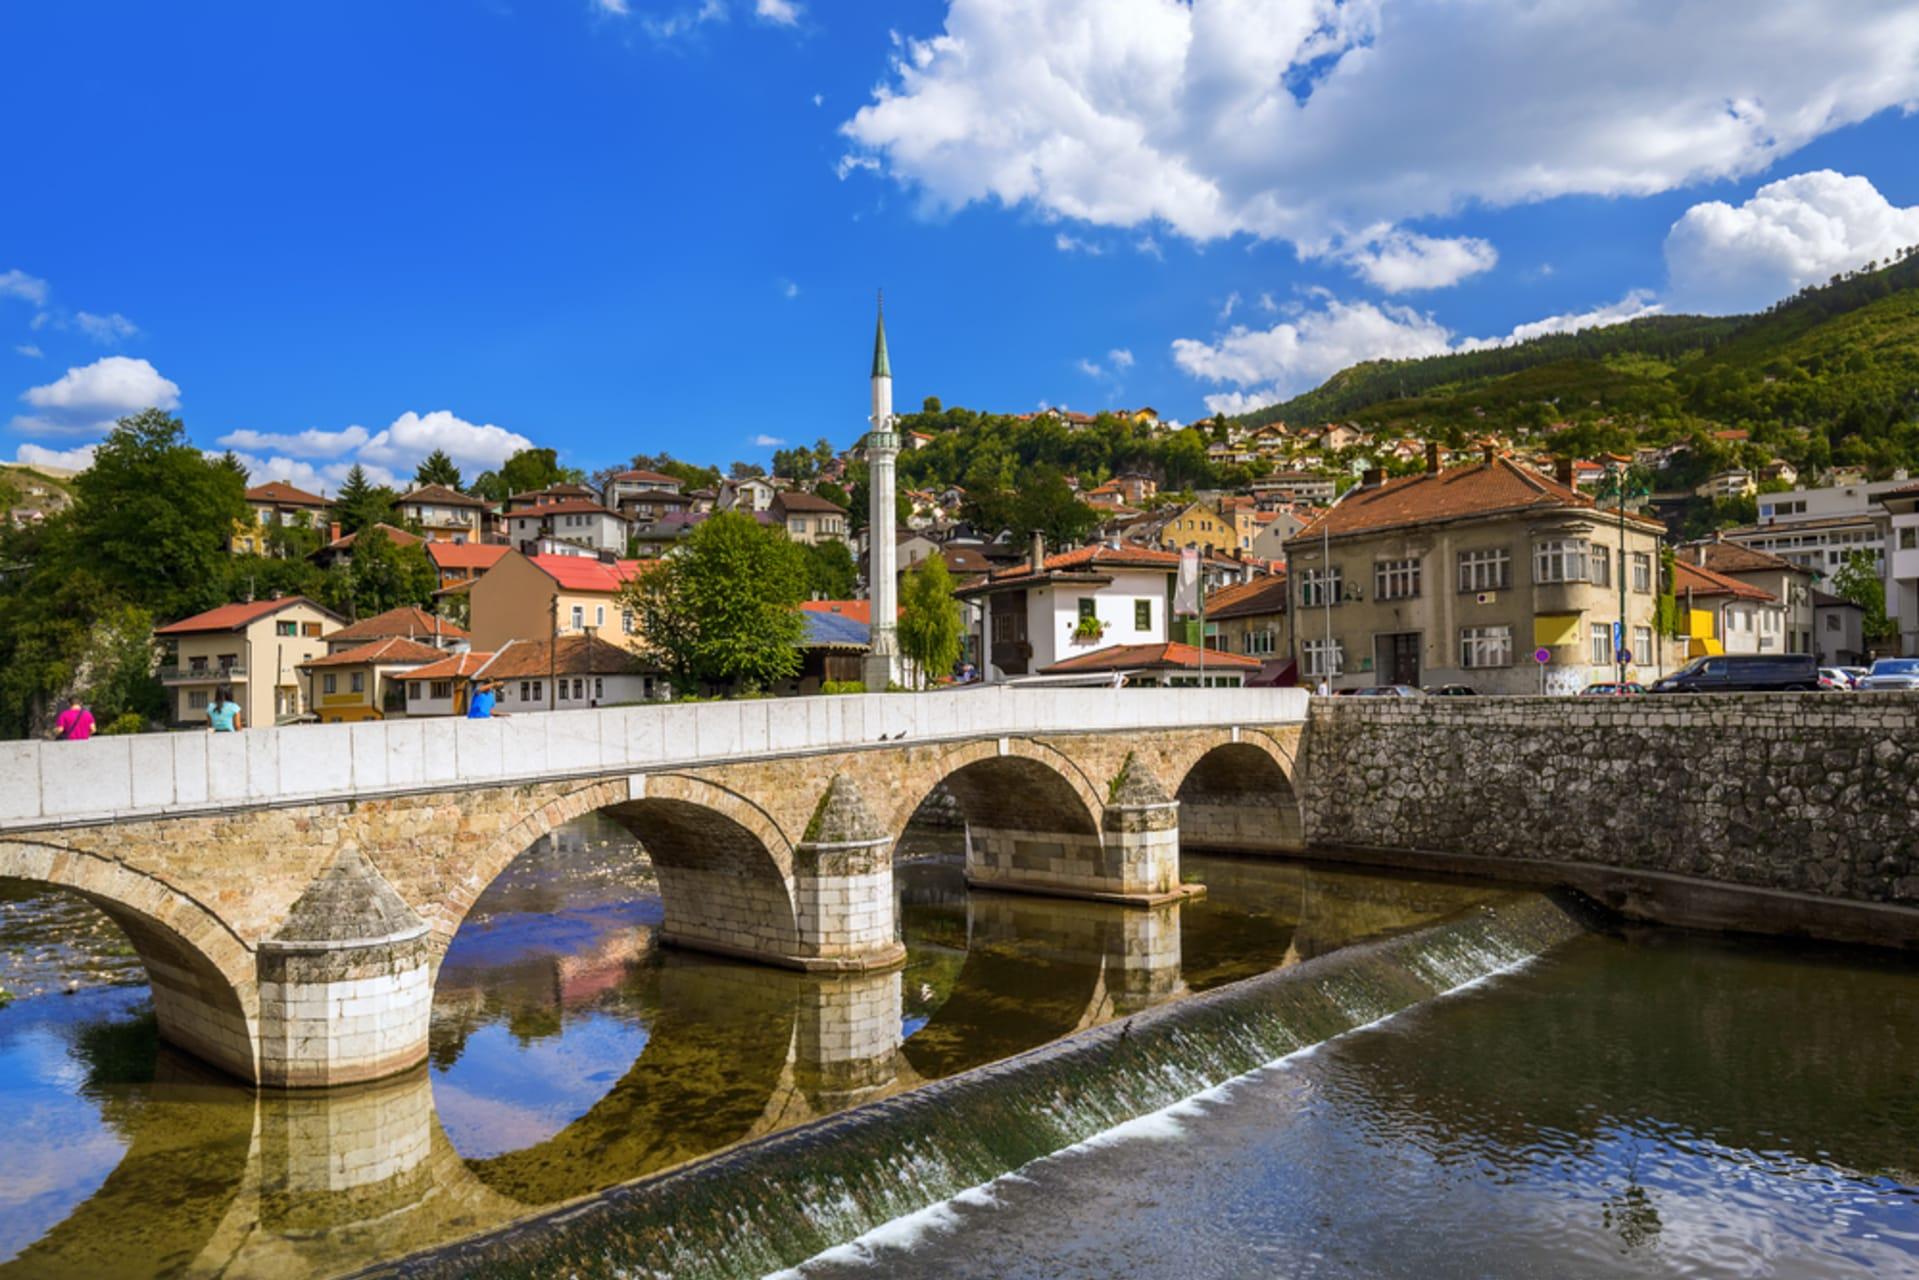 Sarajevo - The 1914 Assassination of Archduke Franz Ferdinand and Sophie